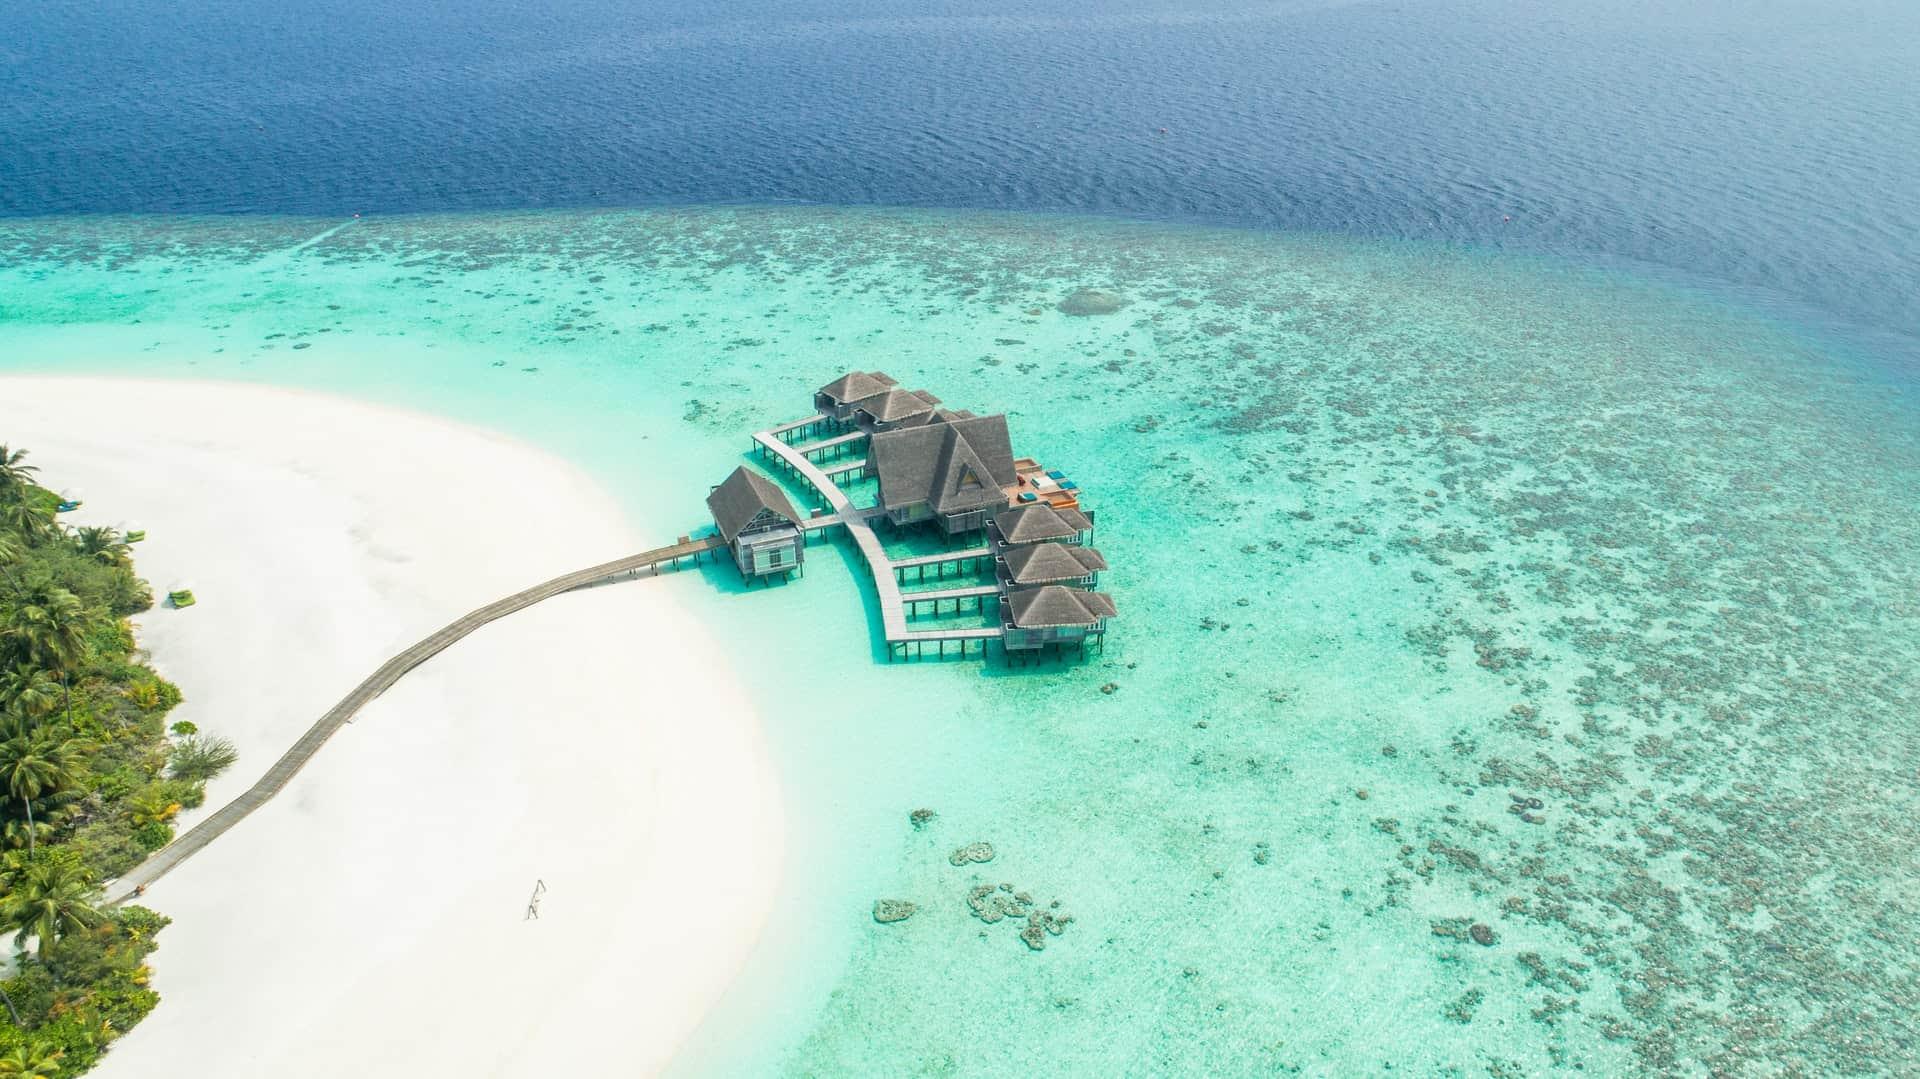 é seguro viajar para as maldivas? medidas covid 19